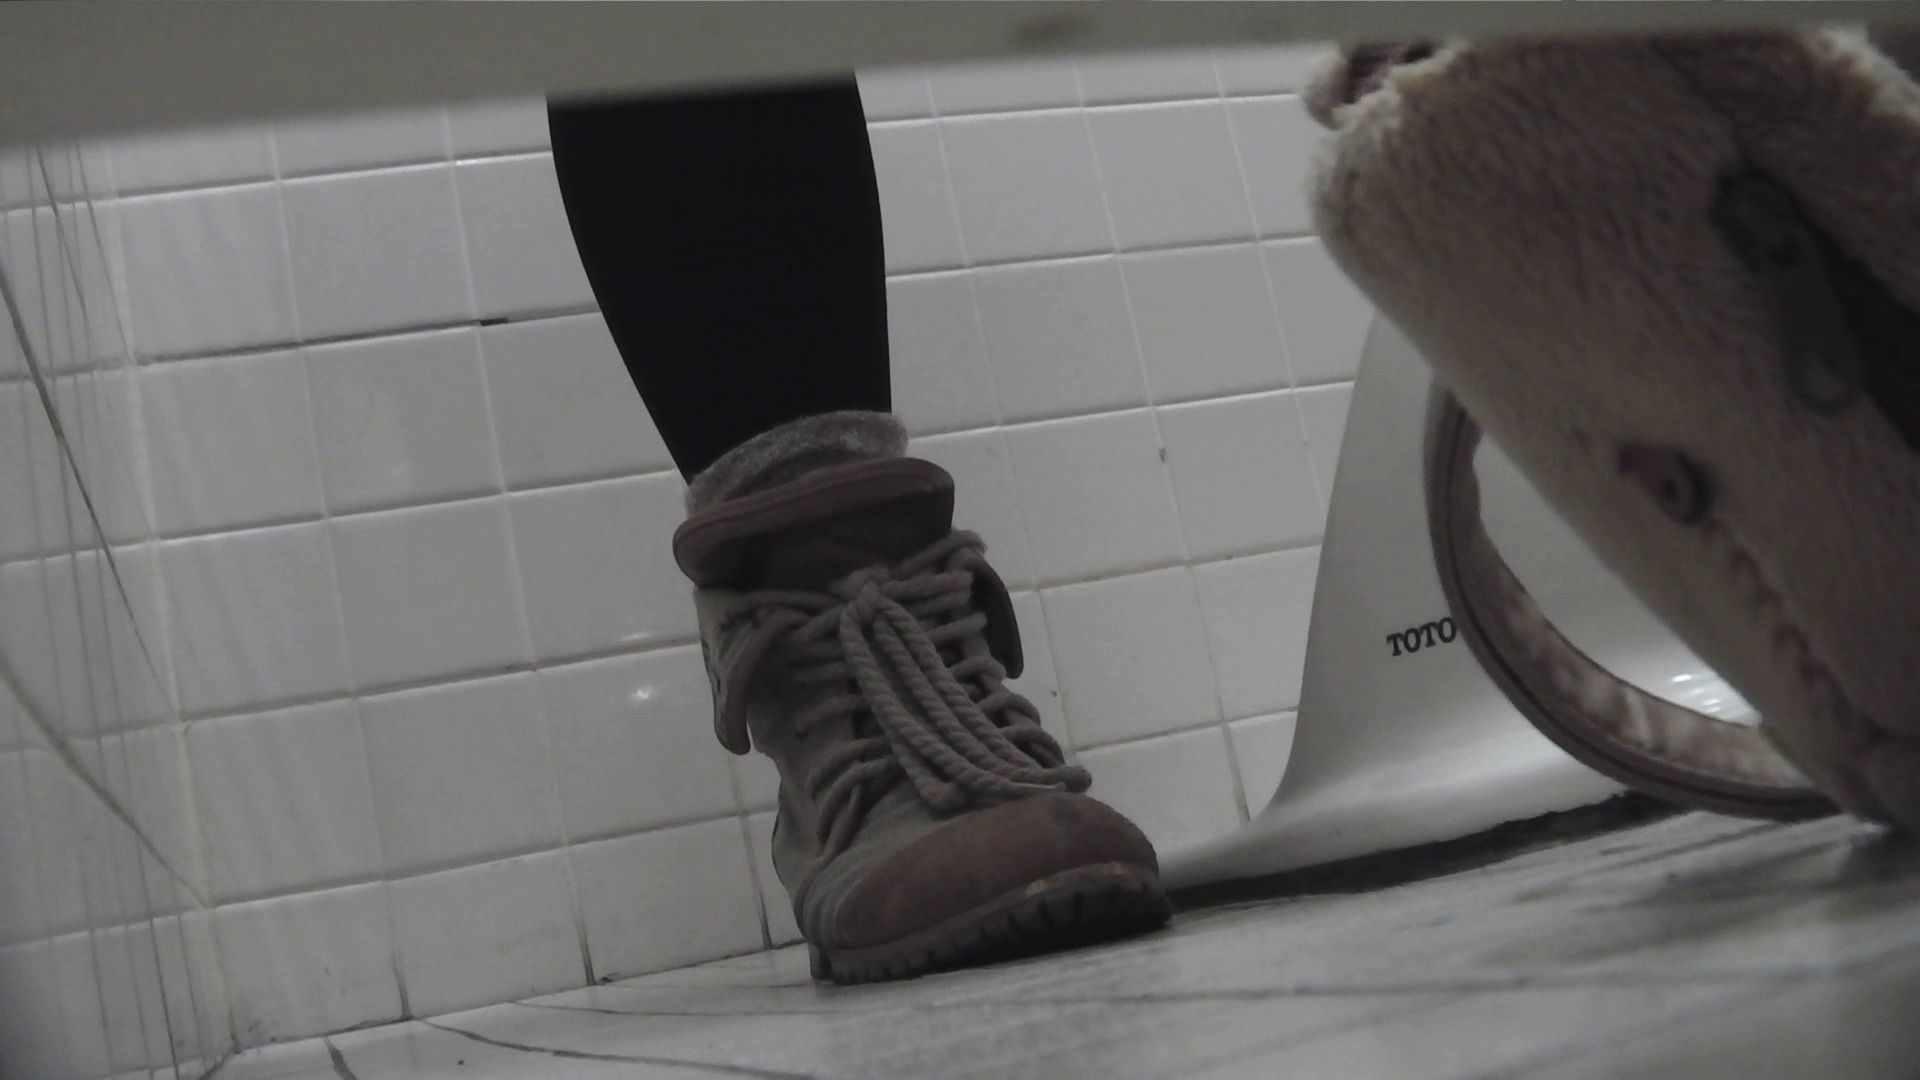 vol.08 命がけ潜伏洗面所! 黒ストッキングが流行りです。 プライベート AV無料動画キャプチャ 95pic 11